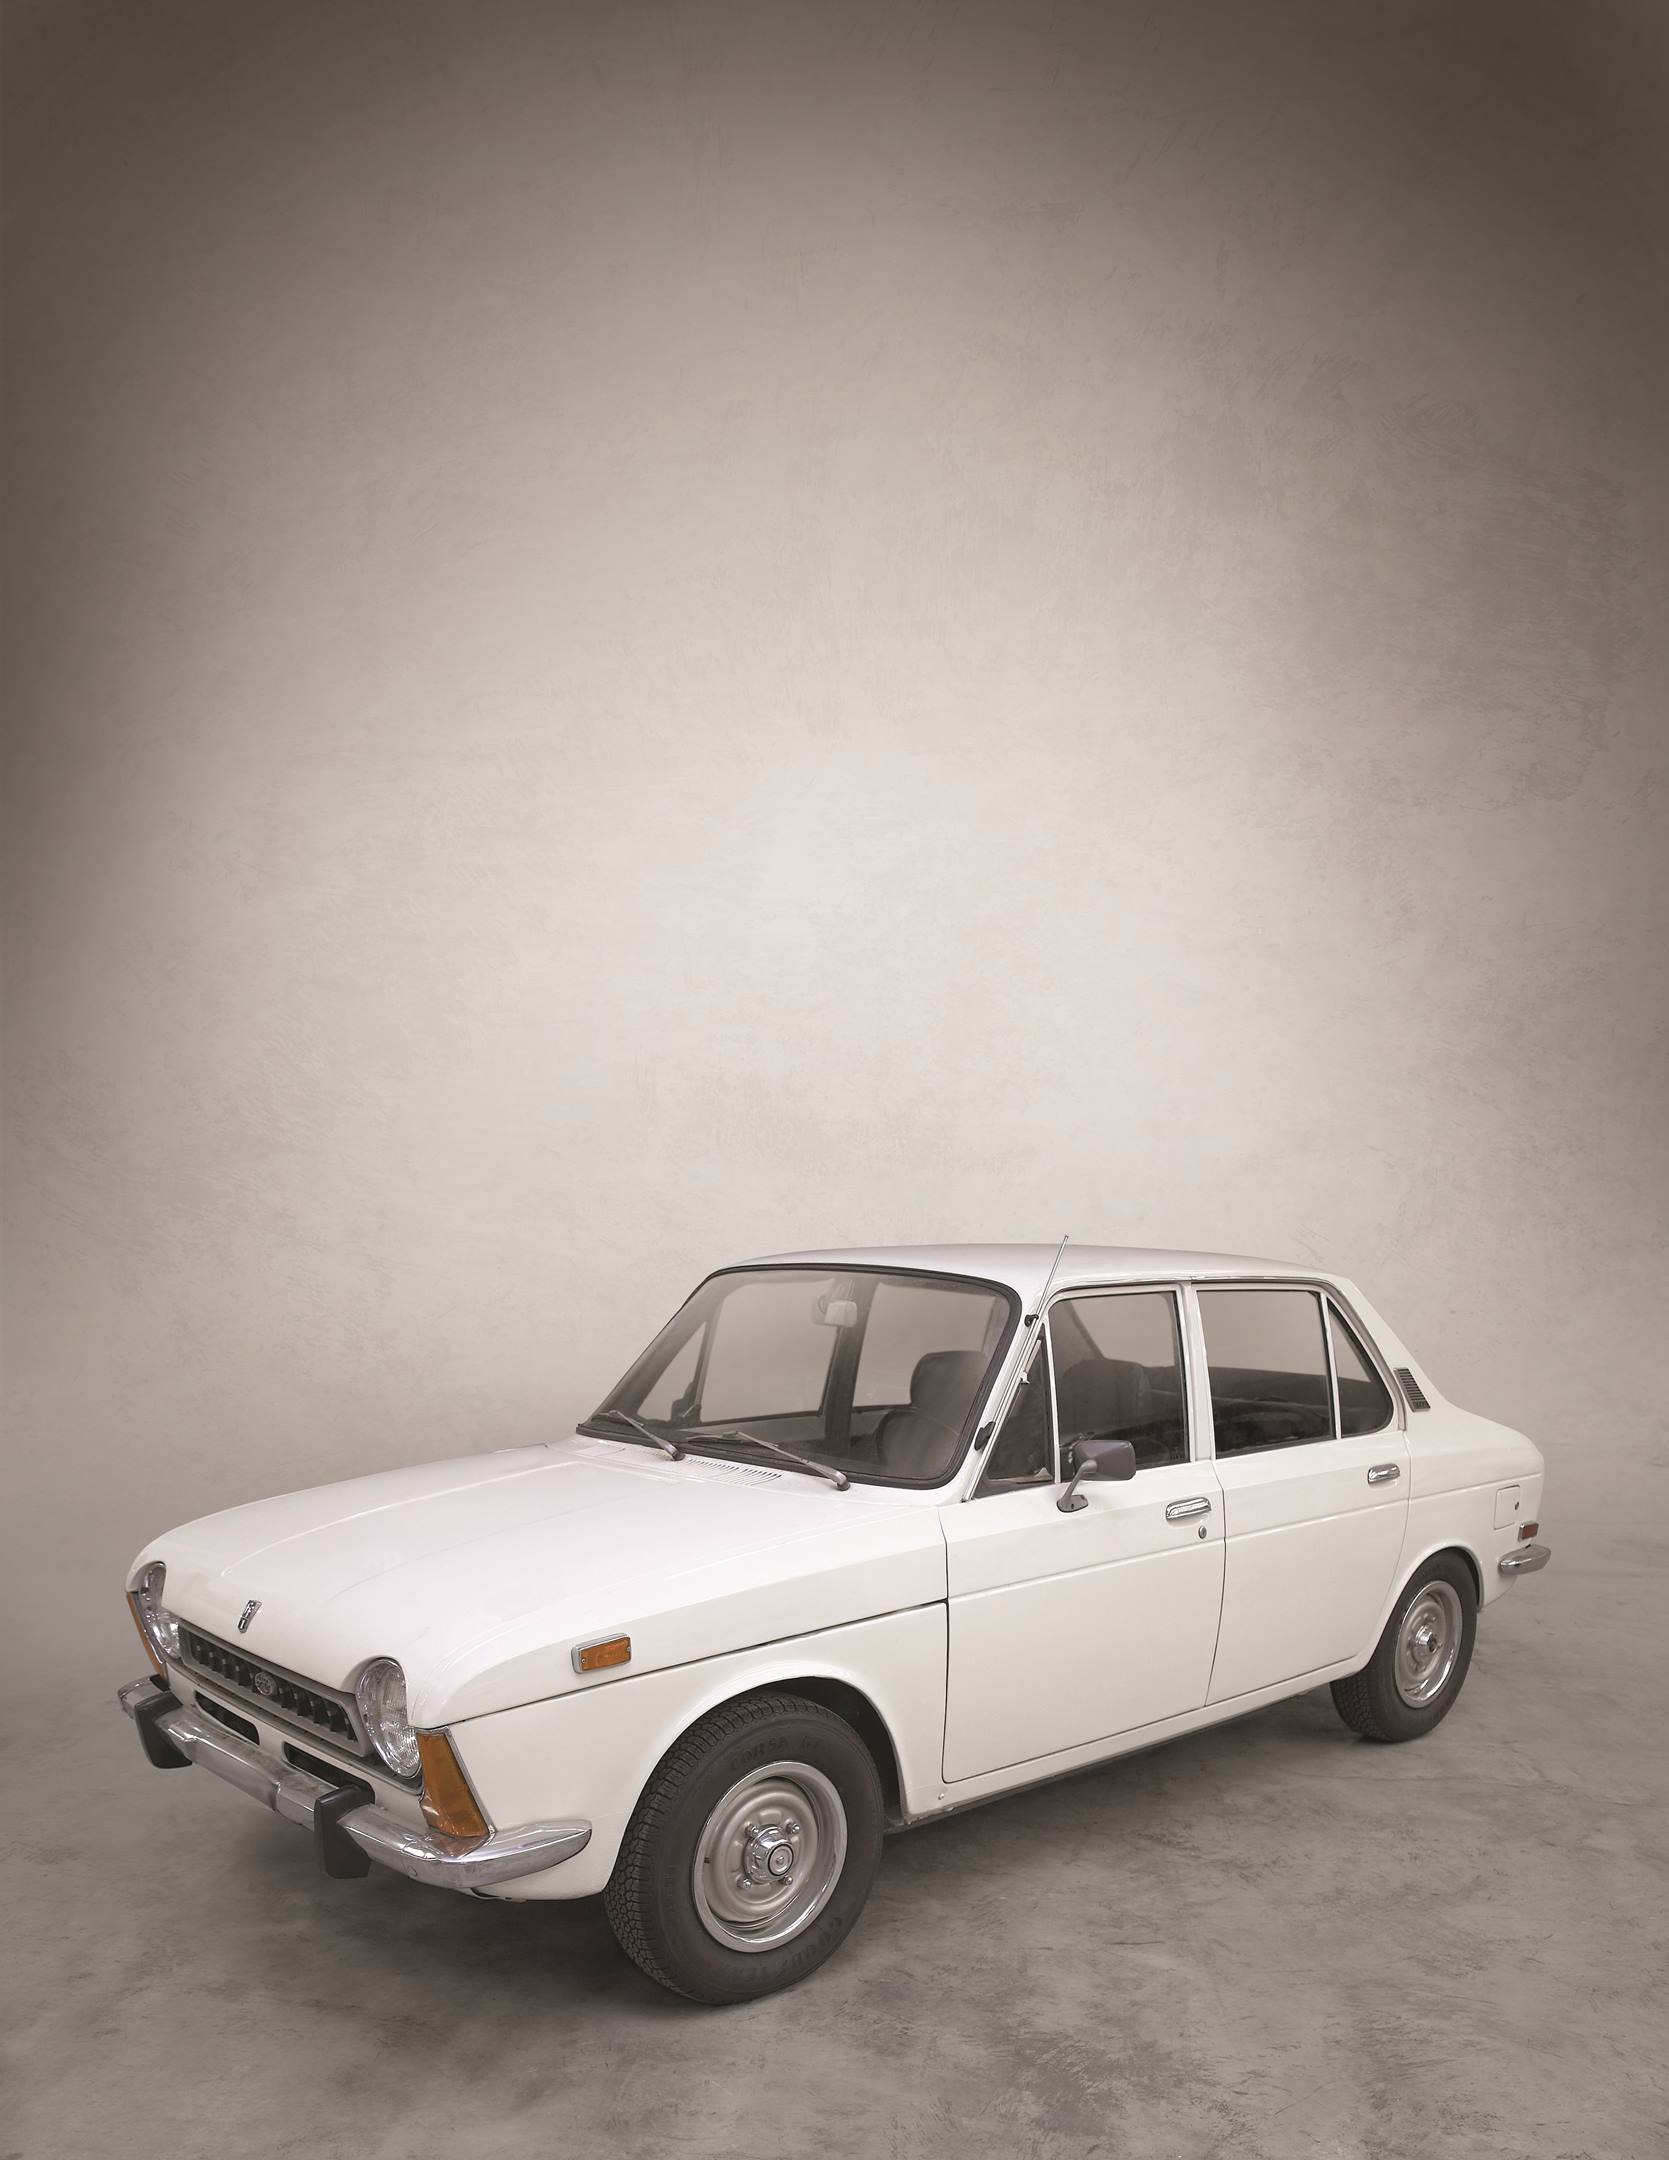 1970 Subaru FF-1 four-door